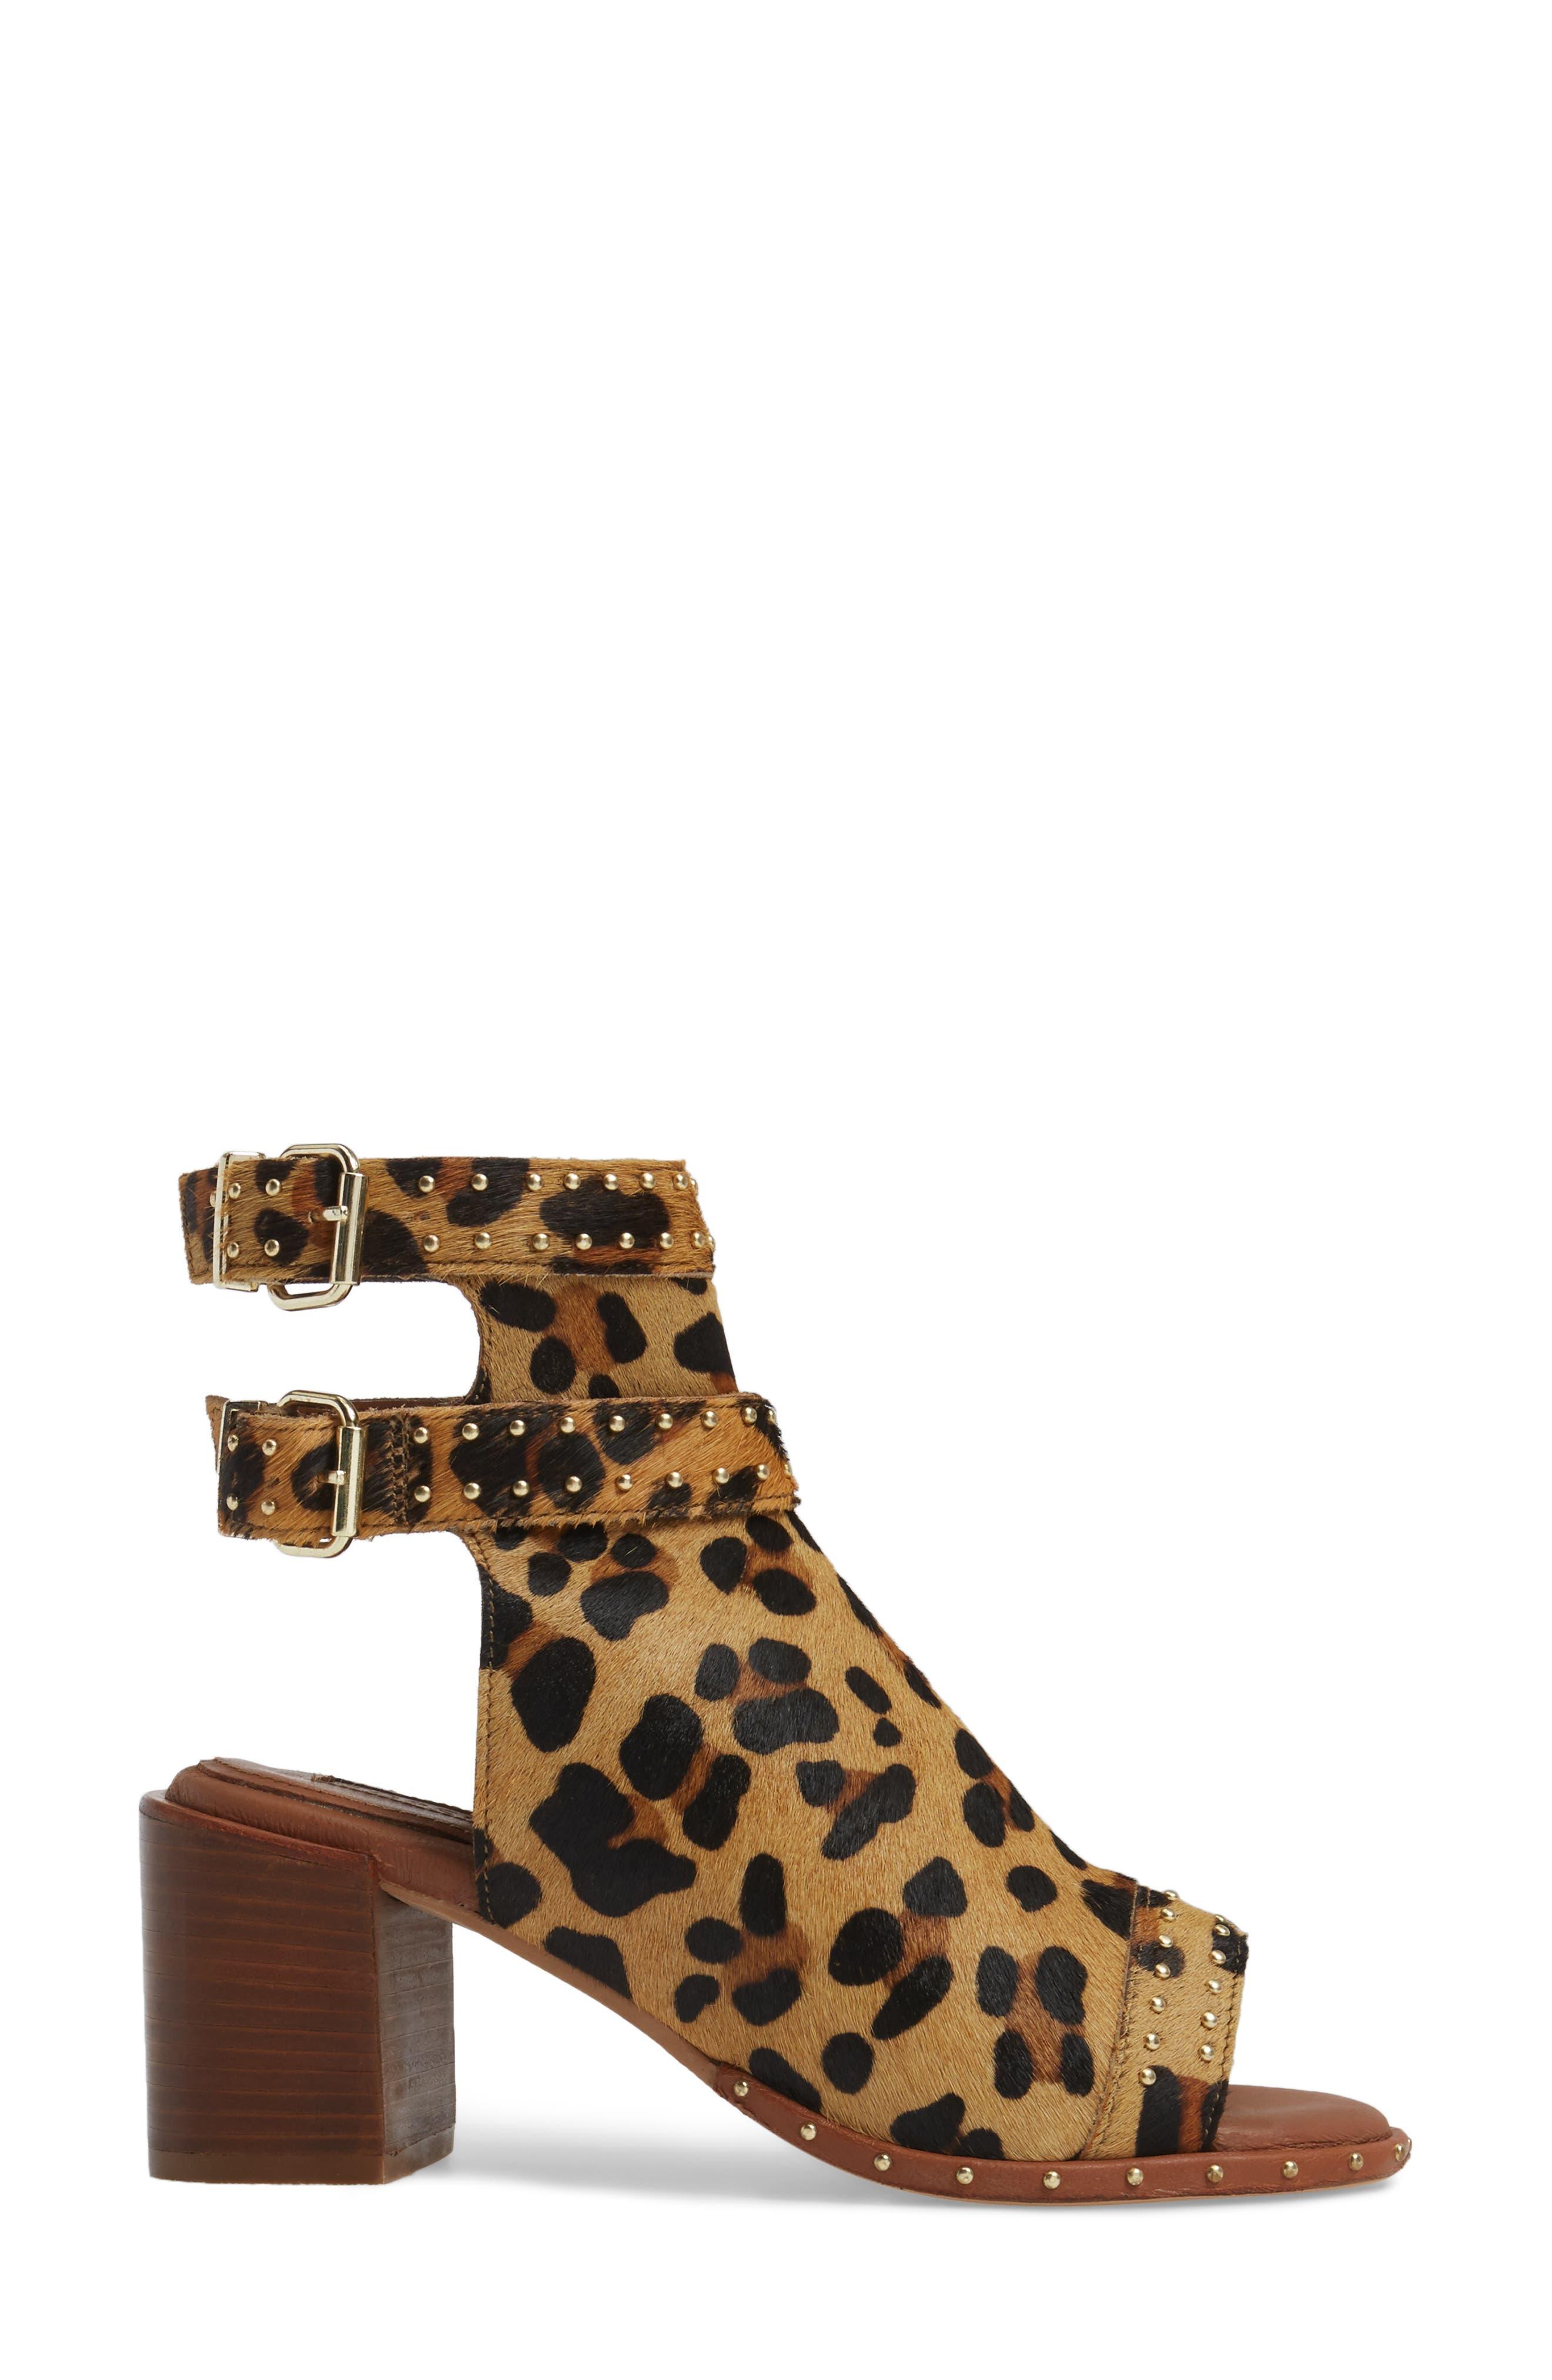 North Studded Bootie Sandal,                             Alternate thumbnail 3, color,                             Leopard